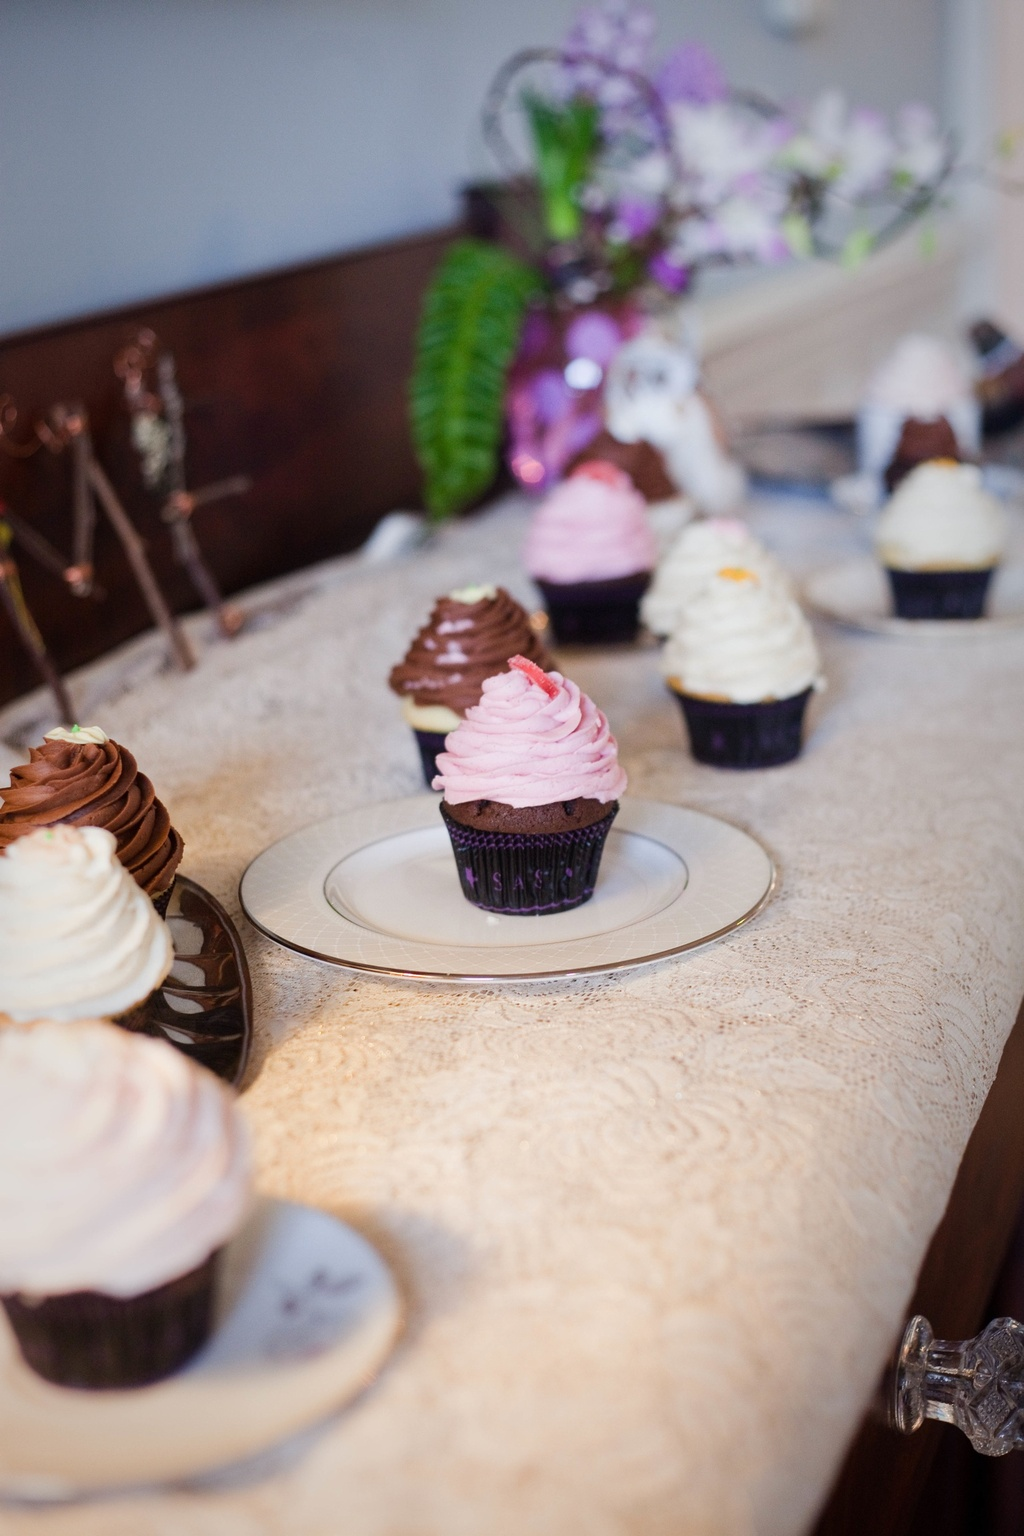 Wedding-cupcakes-alternative-to-wedding-cake-7.full